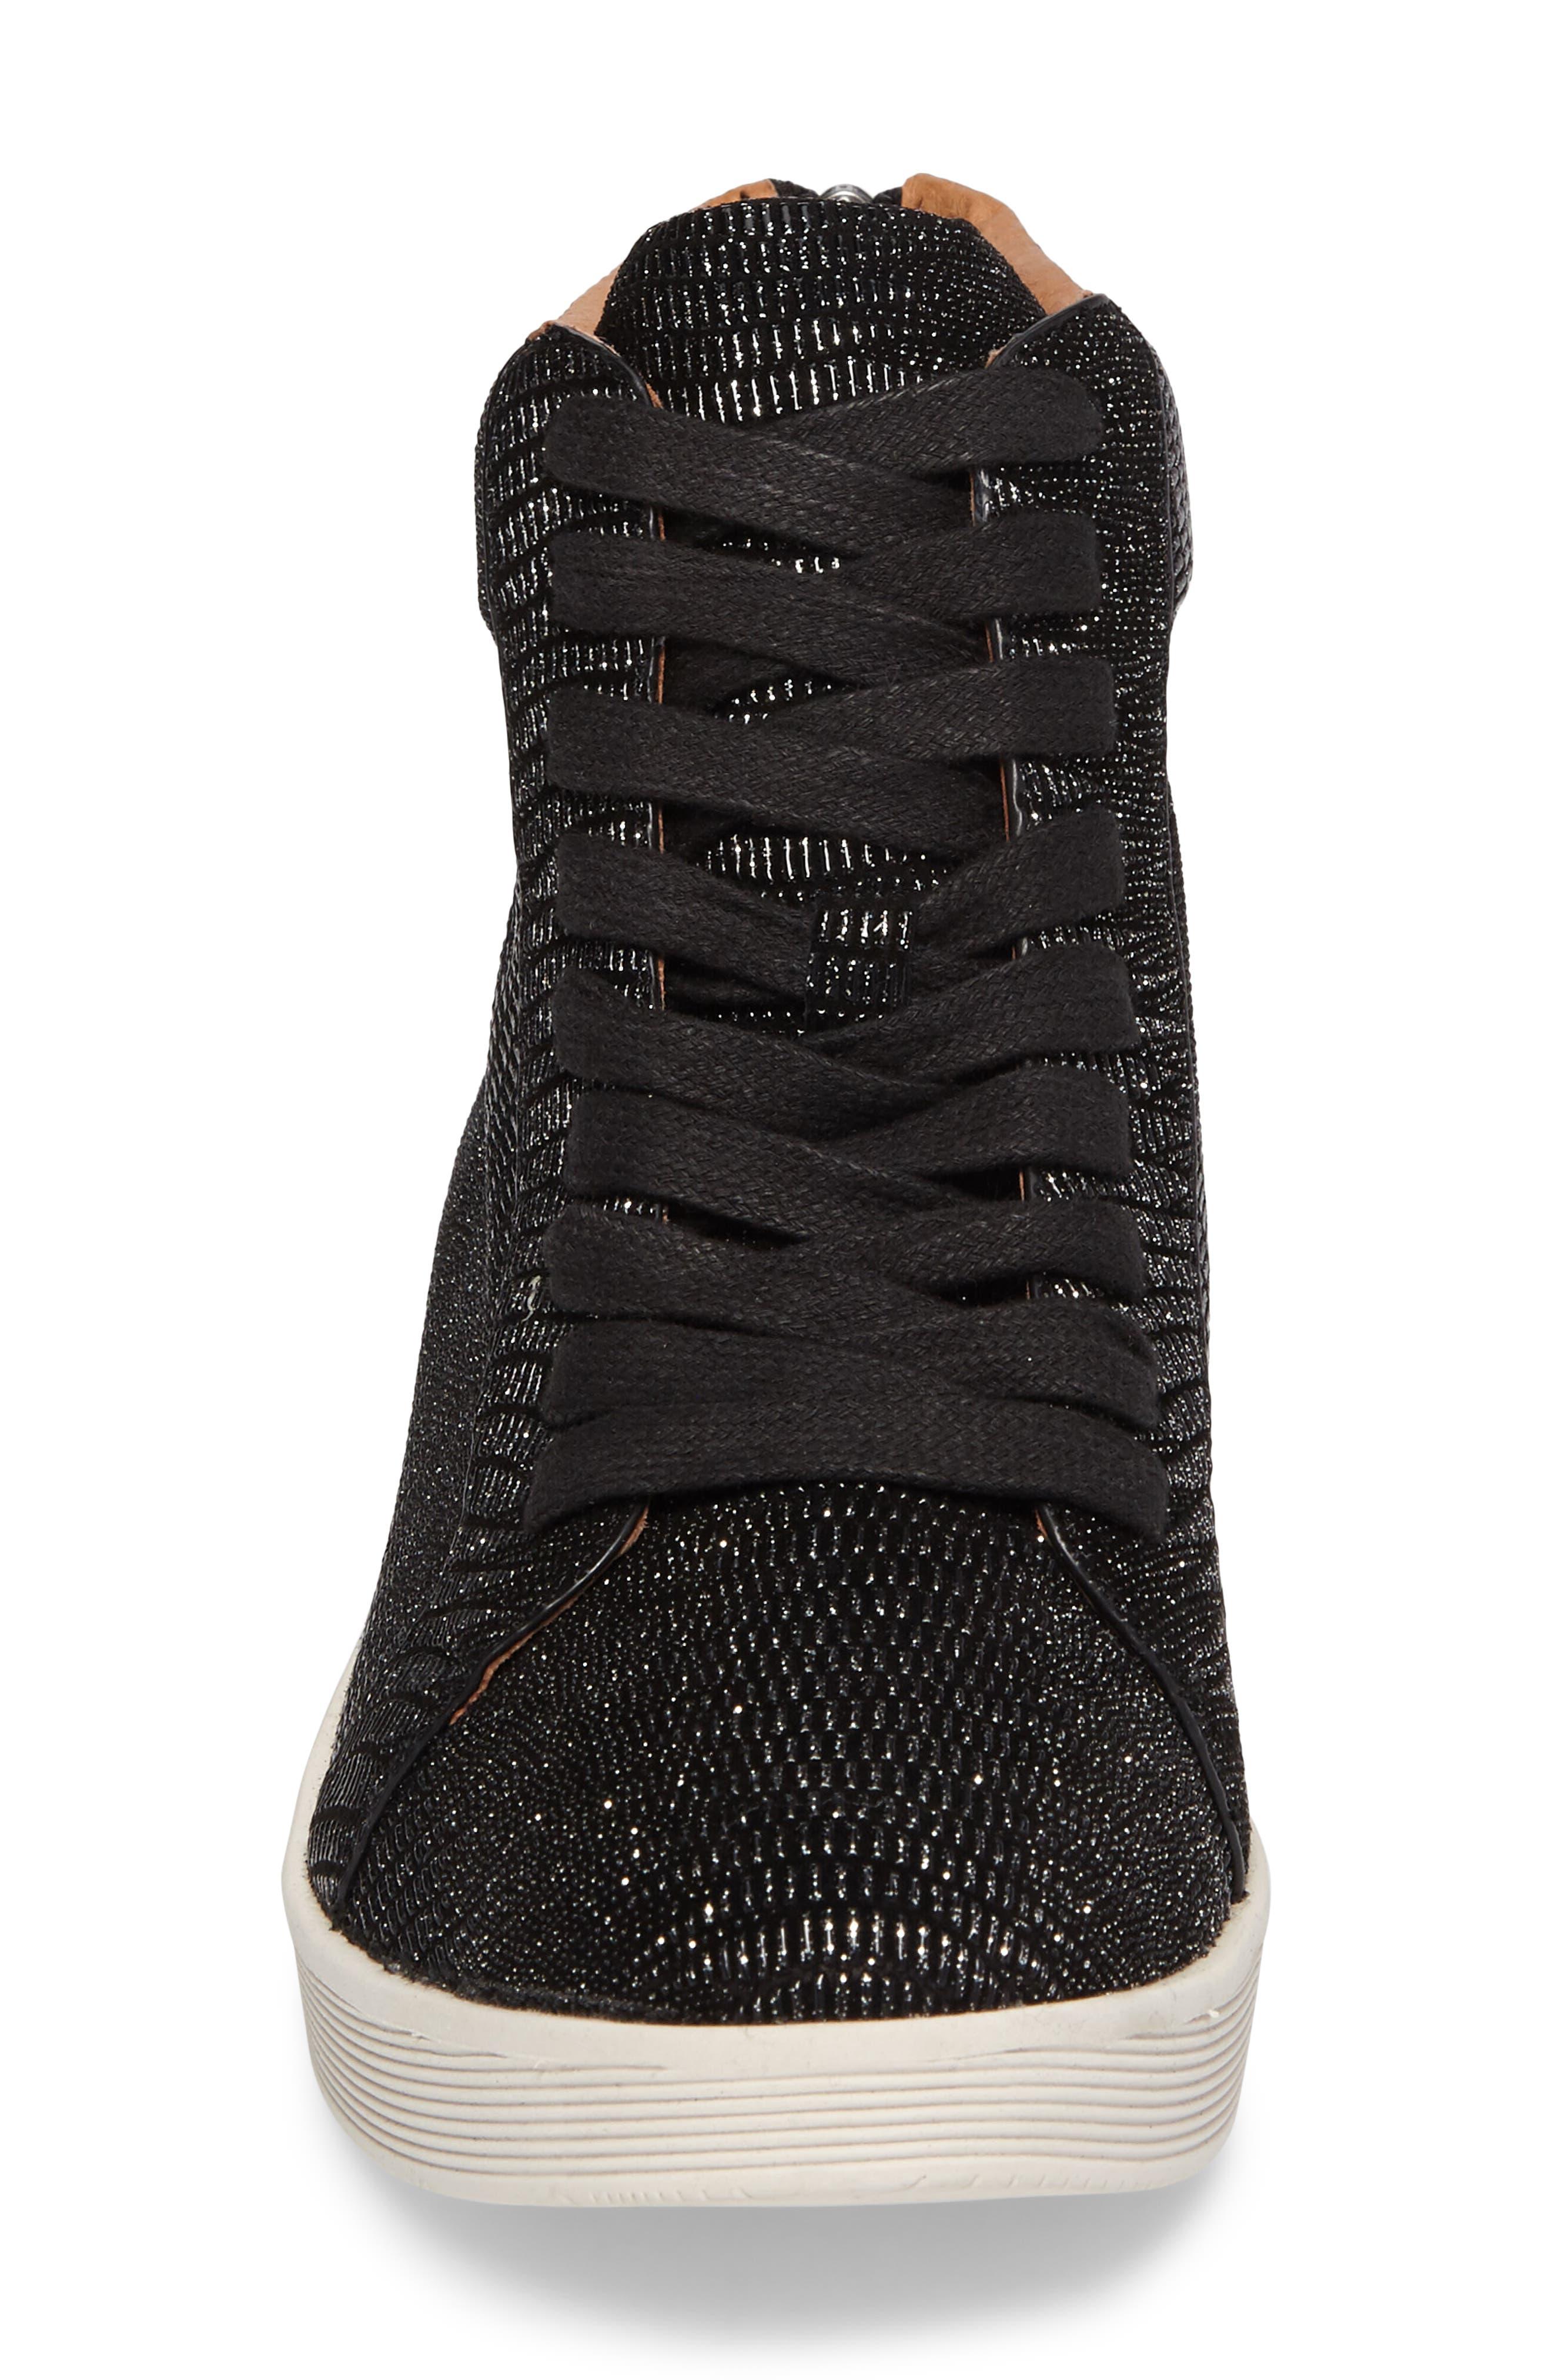 Helka High Top Sneaker,                             Alternate thumbnail 4, color,                             Black Metallic Leather